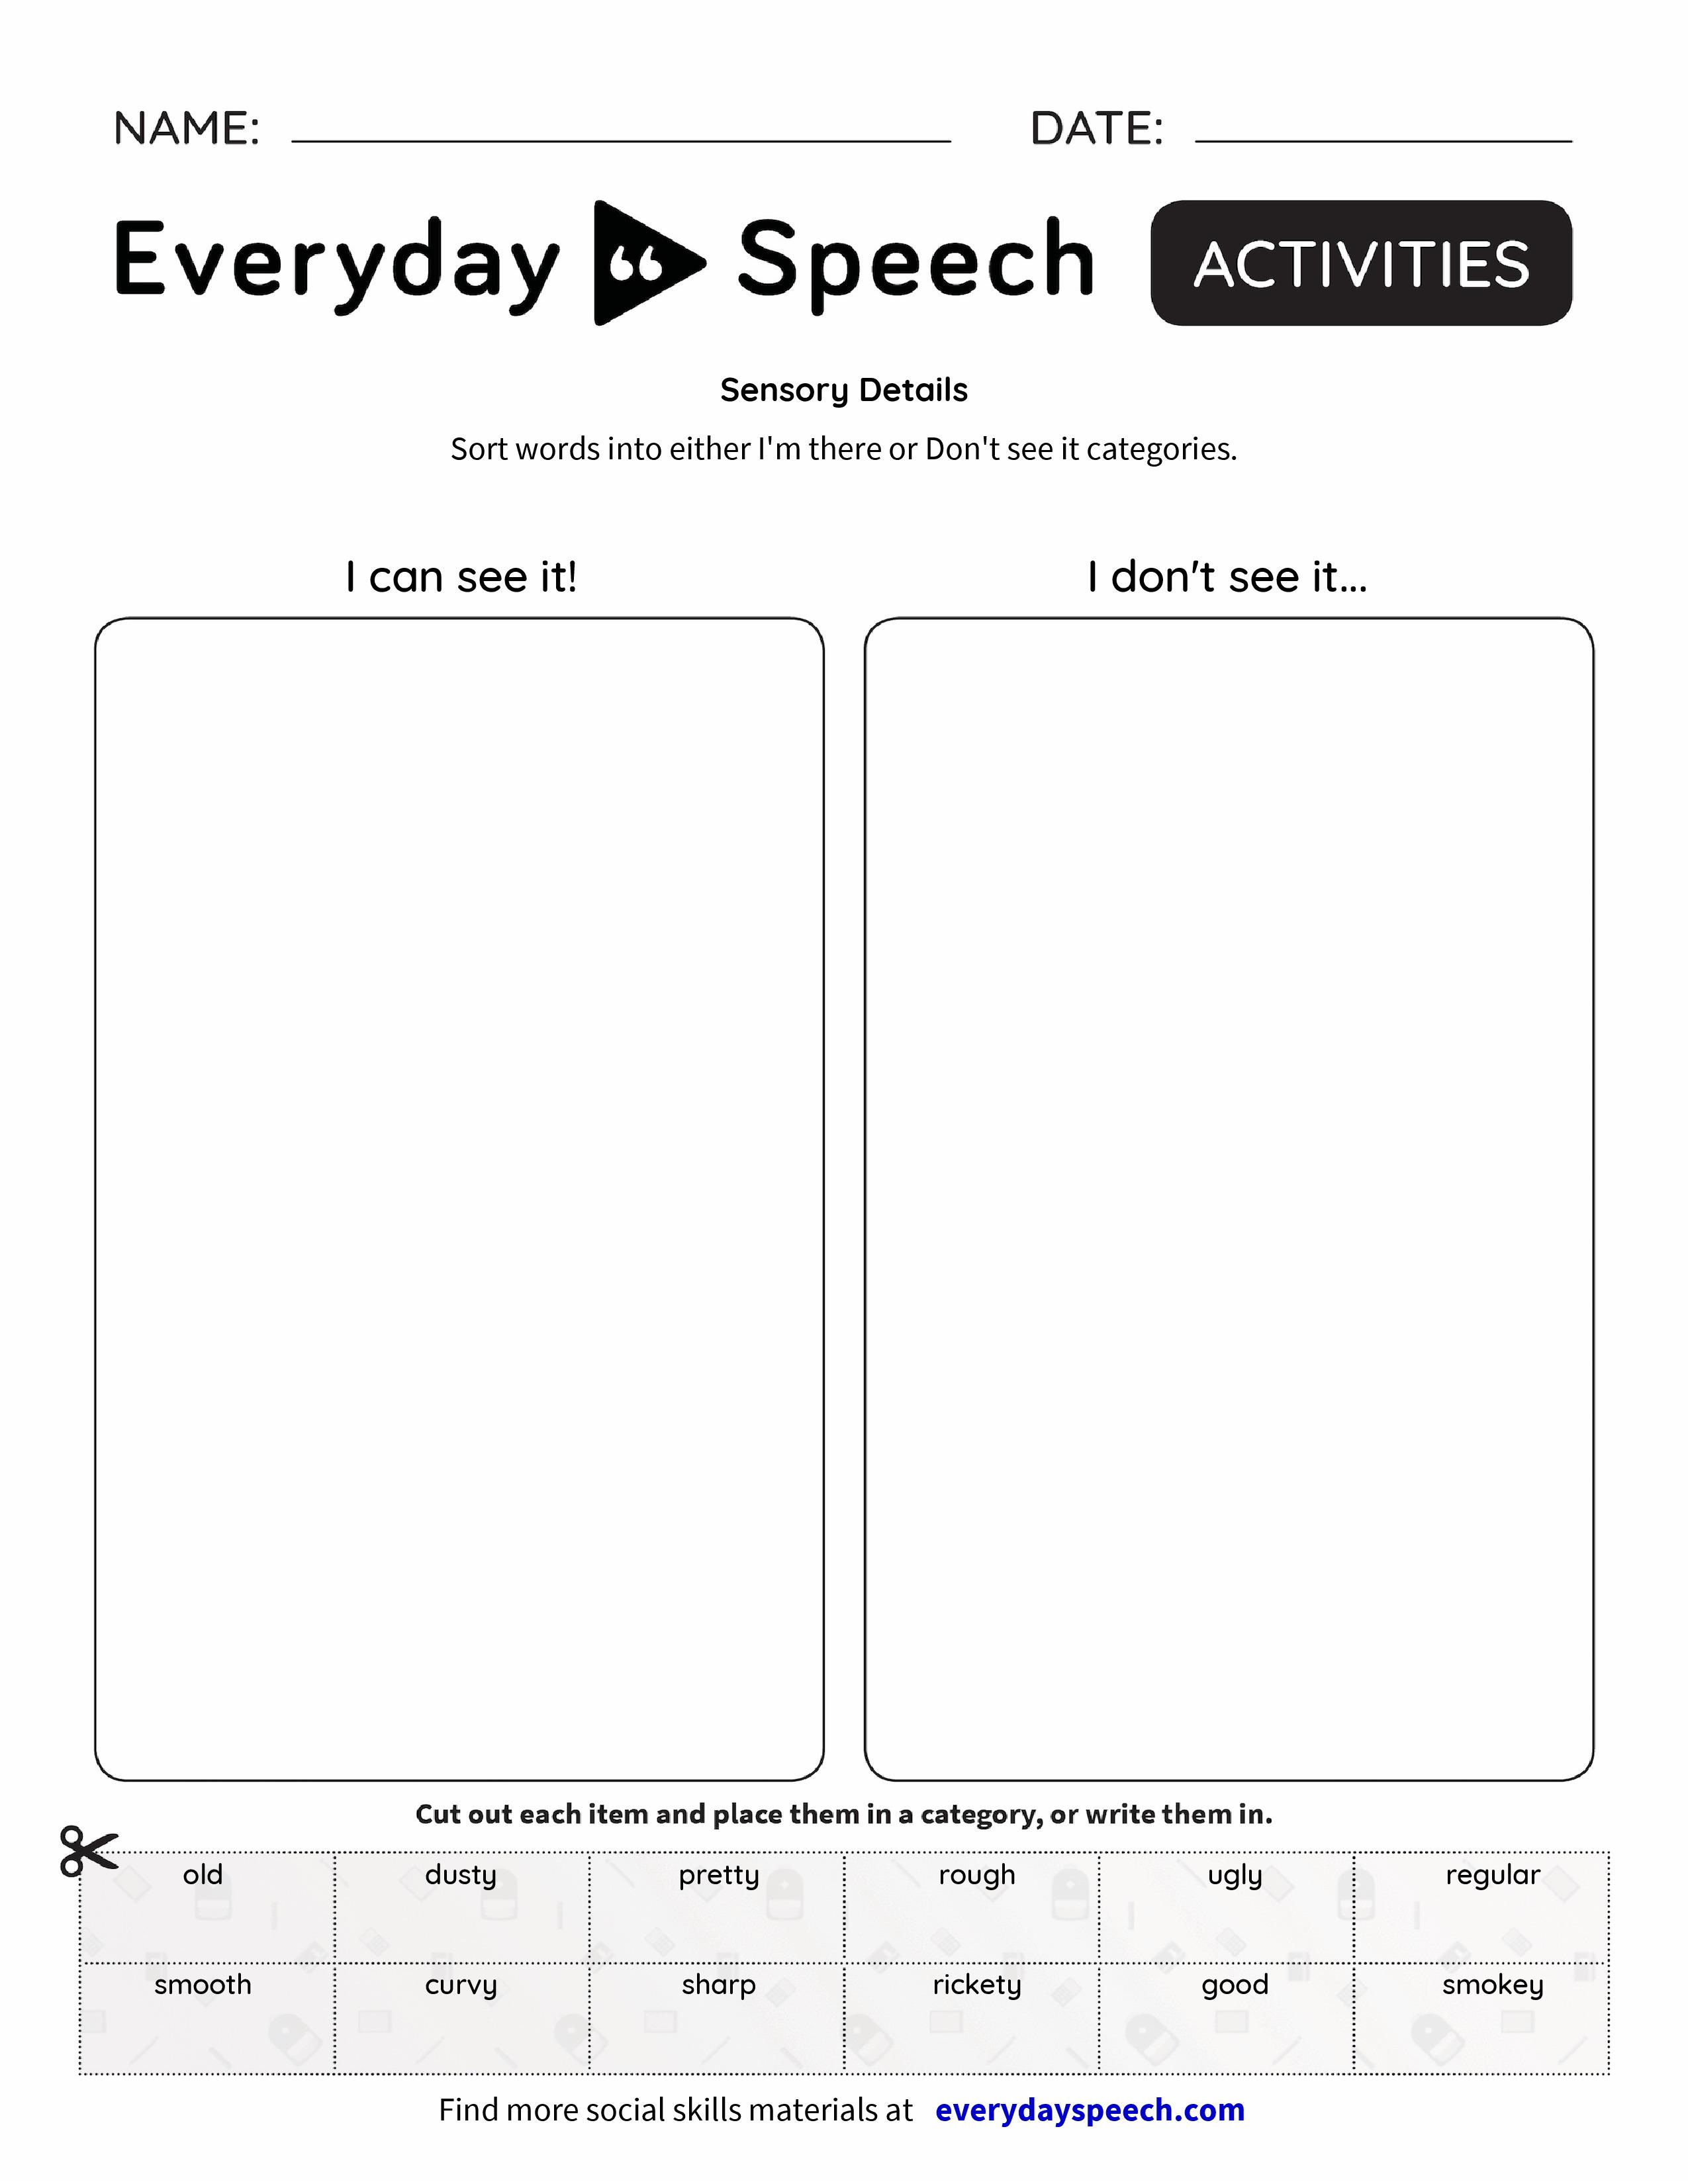 Worksheets Sensory Details Worksheet sensory details everyday speech preview preview